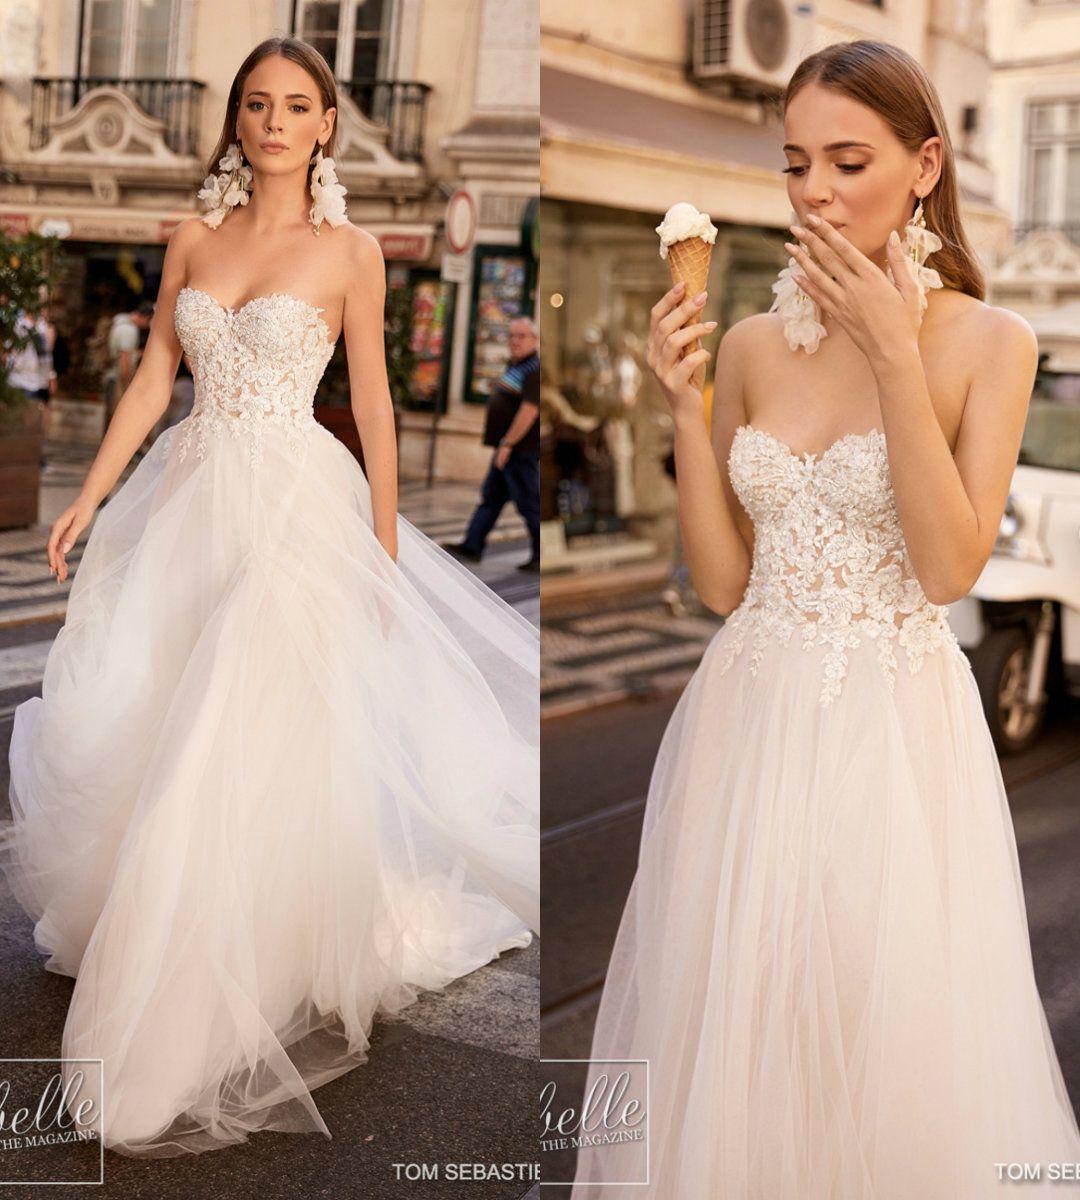 de6c7bfba5ba Discount 2019 Gali Karten Beach Wedding Dresses Sweetheart Lace Appliqued  Bodice Beads A Line Floor Length Boho Wedding Dress Custom Bohemian Bridal  ...